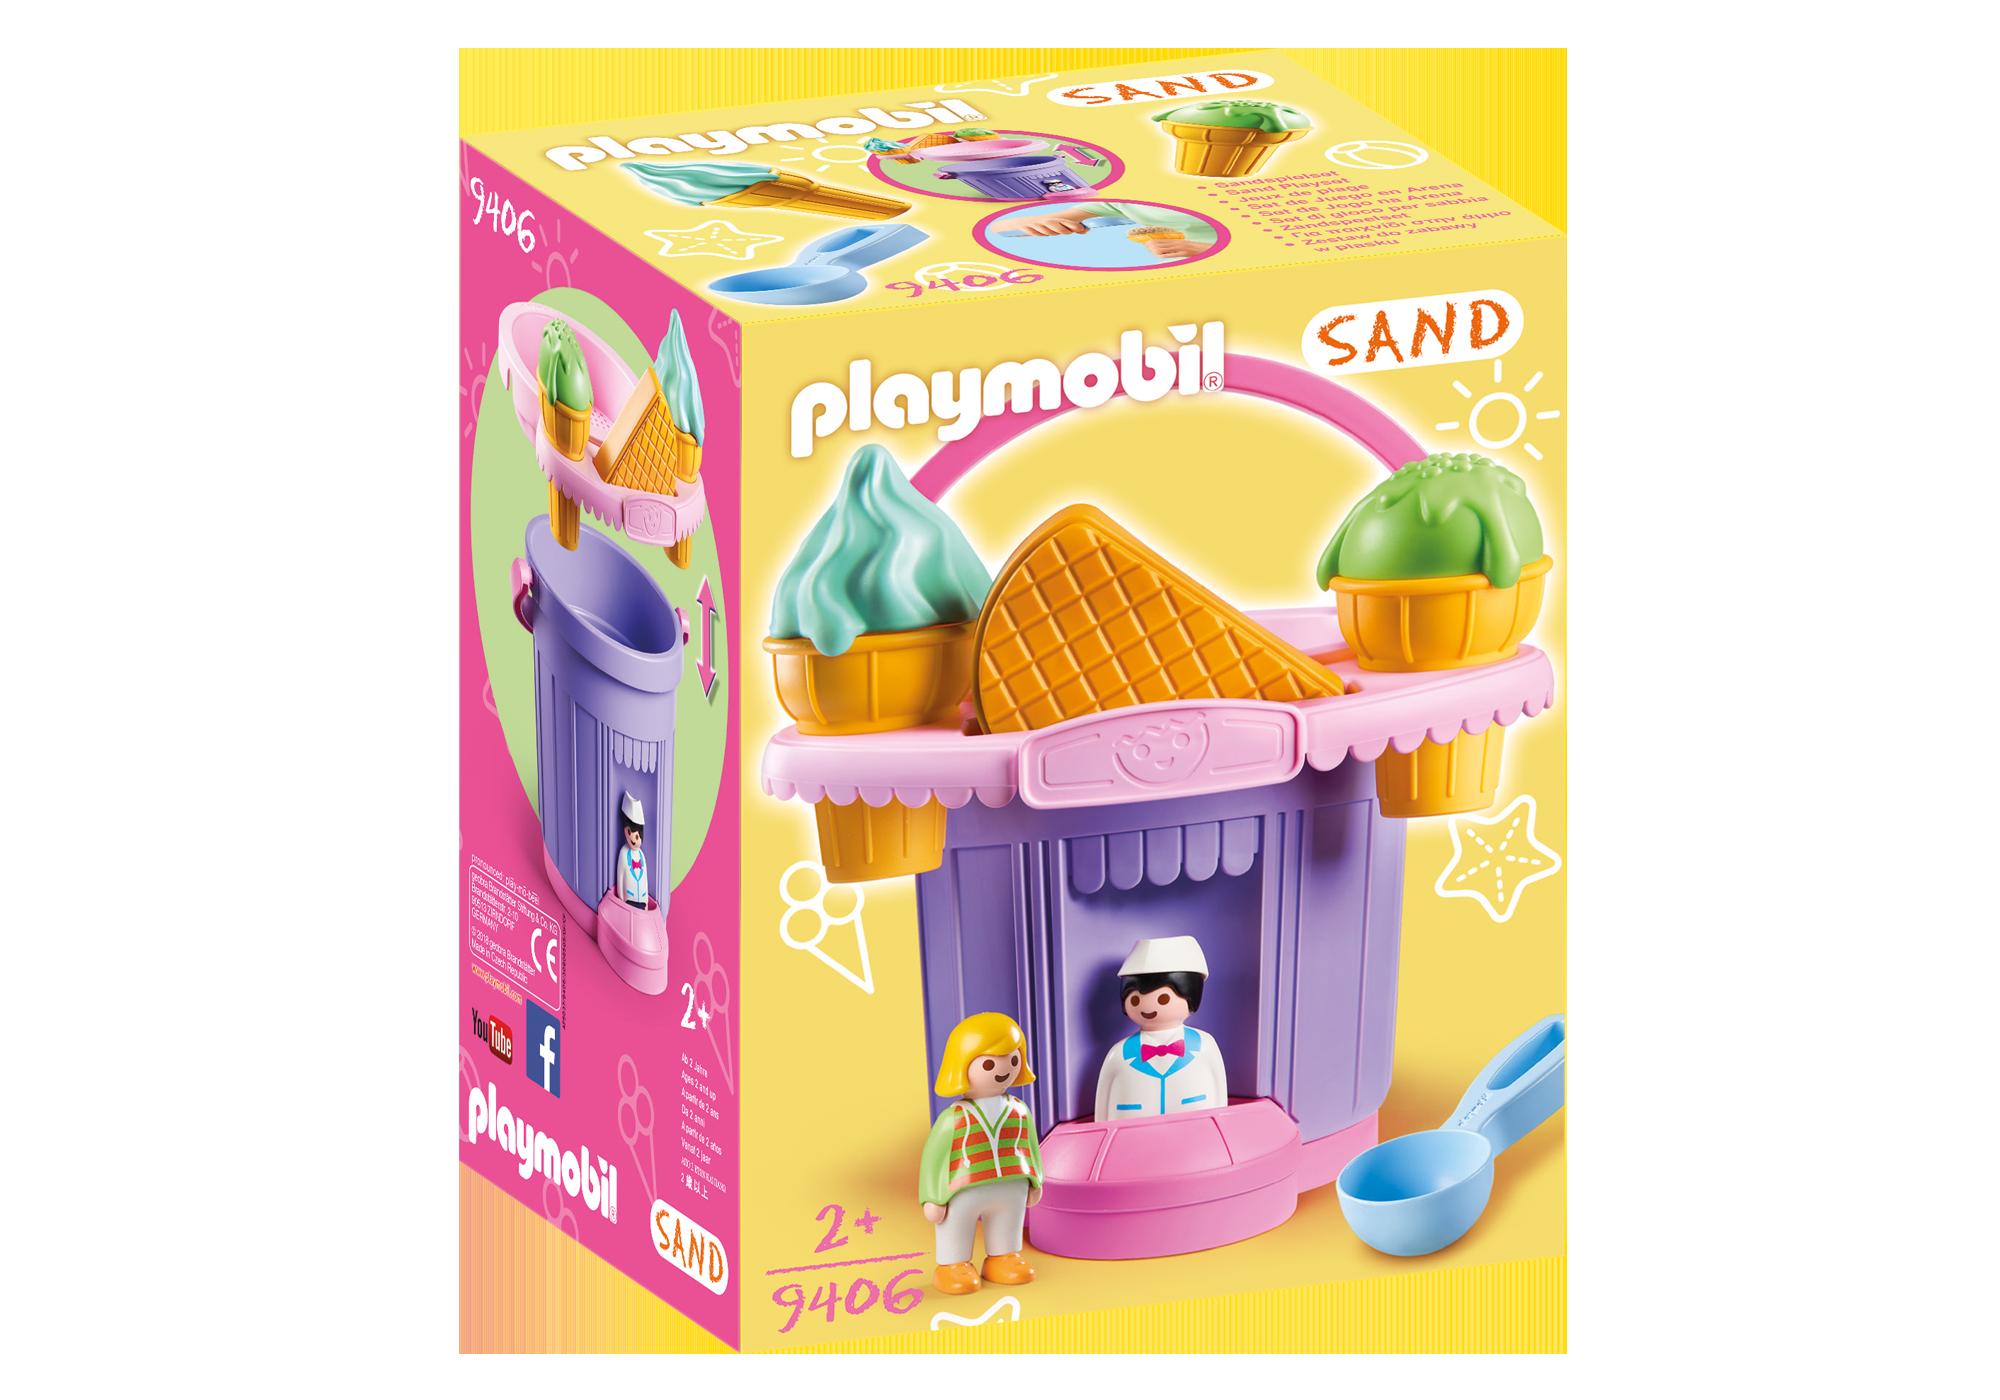 http://media.playmobil.com/i/playmobil/9406_product_box_front/Ice Cream Shop Sand Bucket